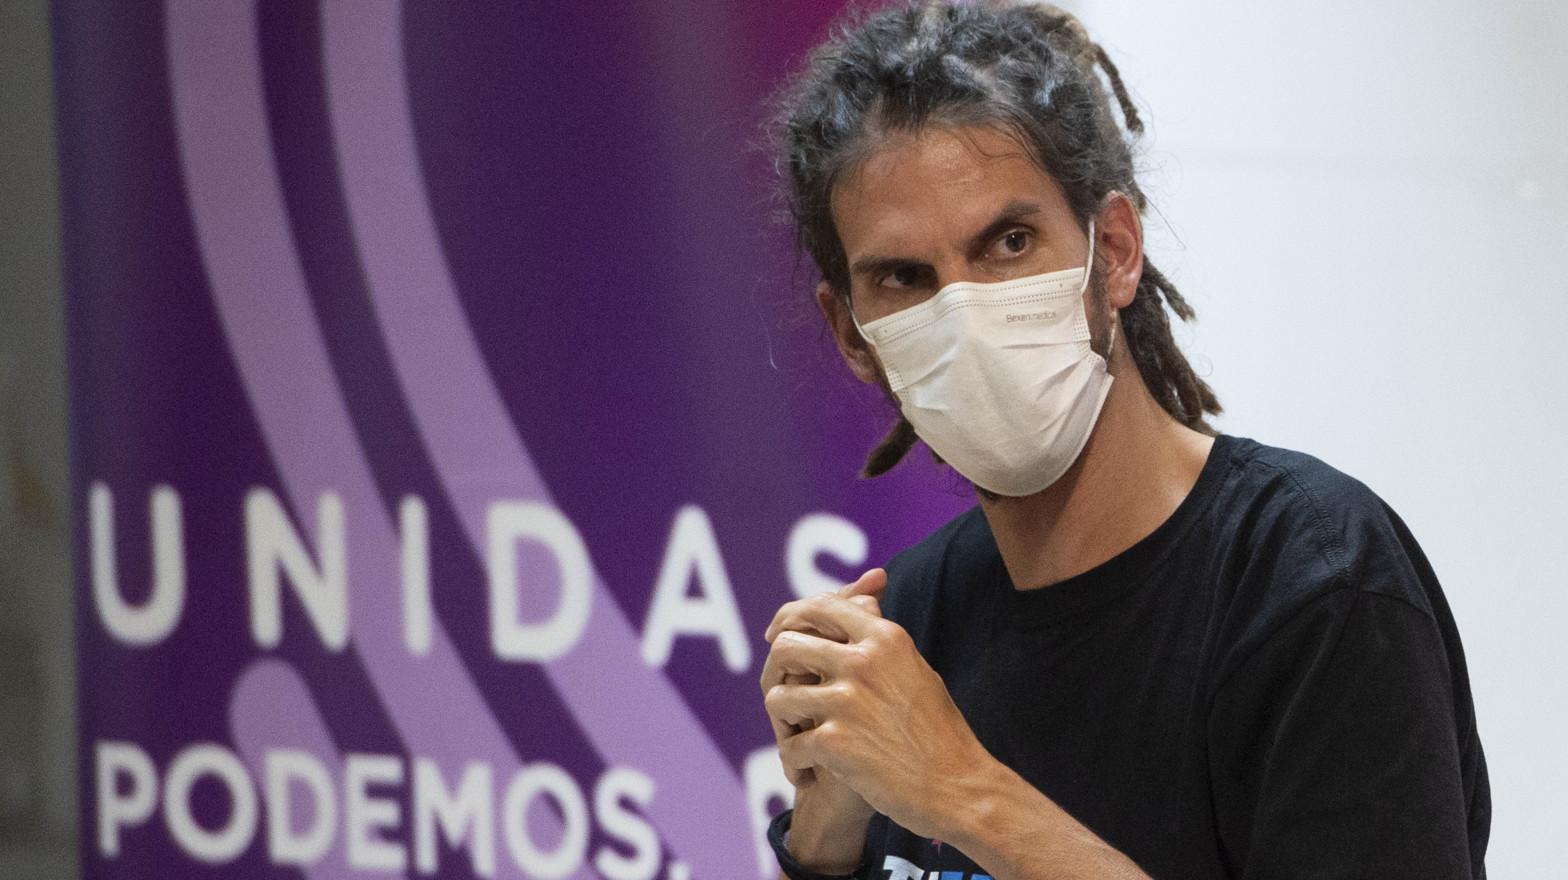 La Fiscalía pide seis meses de cárcel para Alberto Rodríguez (Podemos) por golpear a un policía